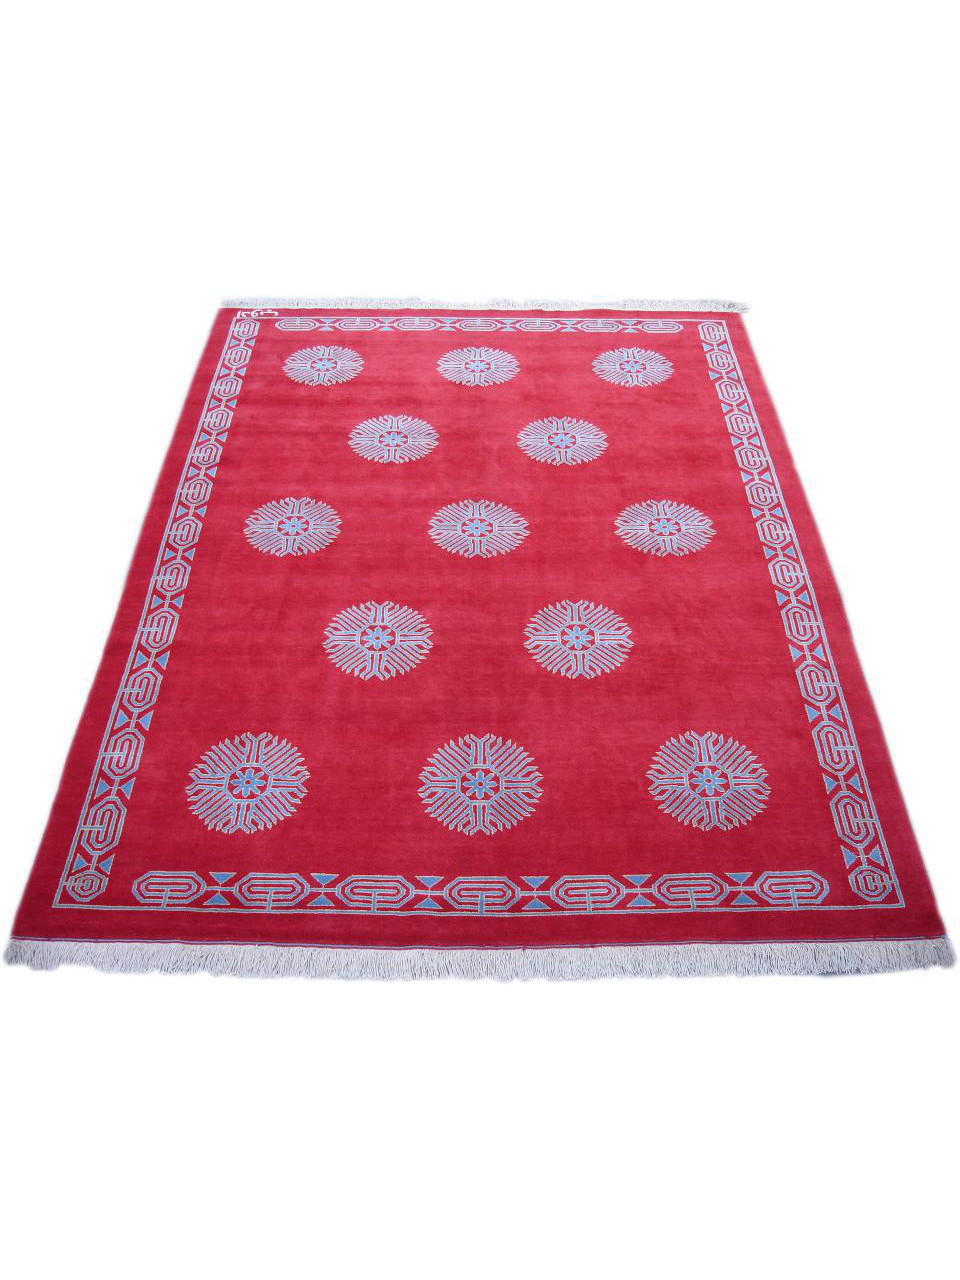 Classic rugs - Shaymak special design